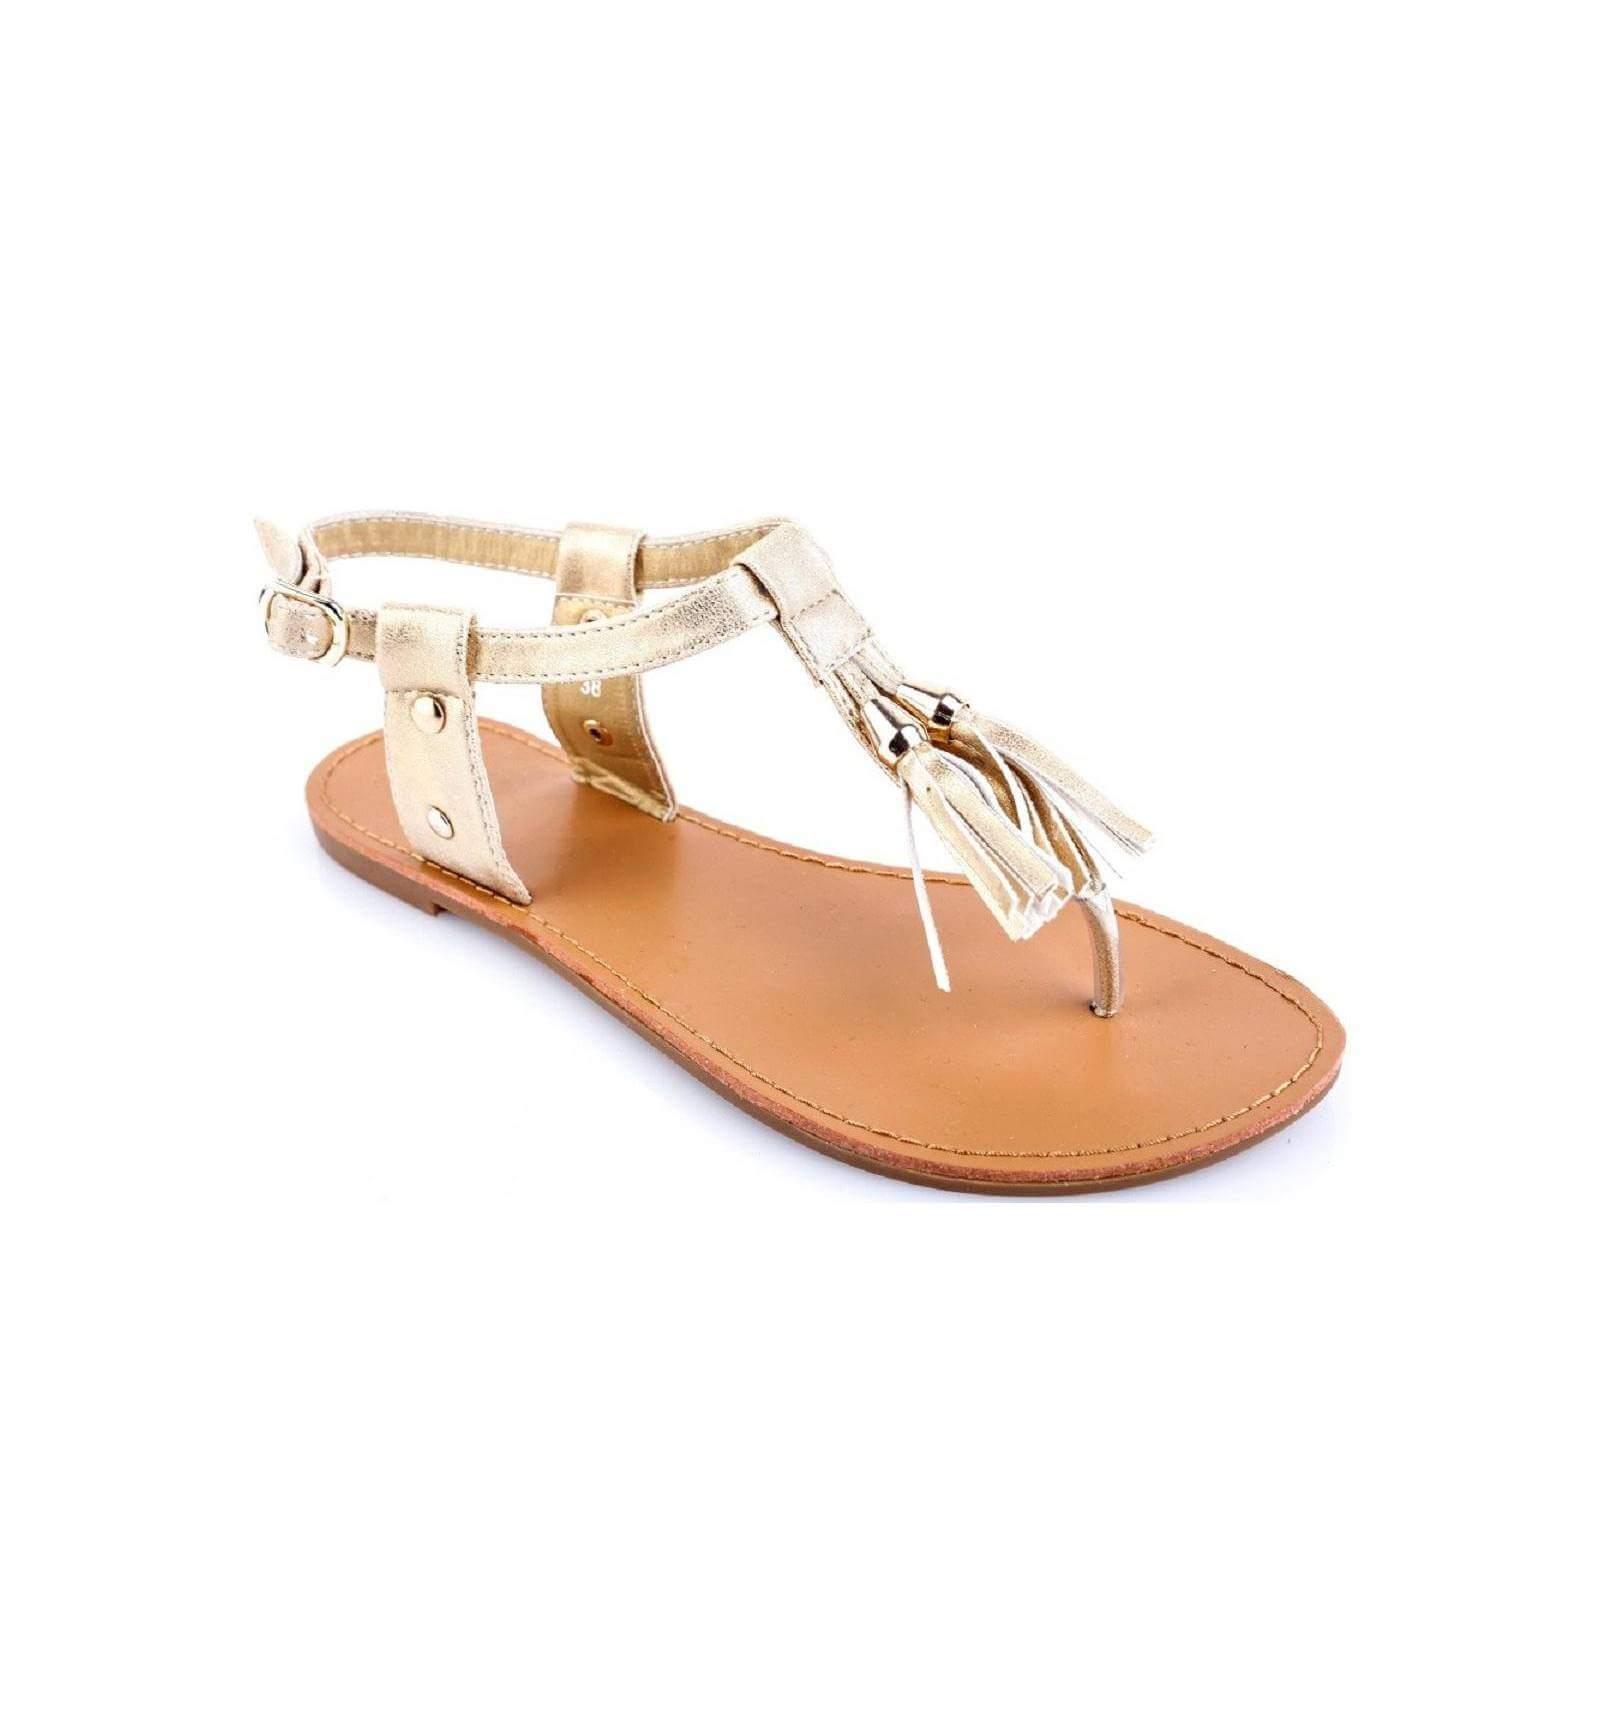 la paire de sandale pretty simili cuir frange dor e ultra. Black Bedroom Furniture Sets. Home Design Ideas